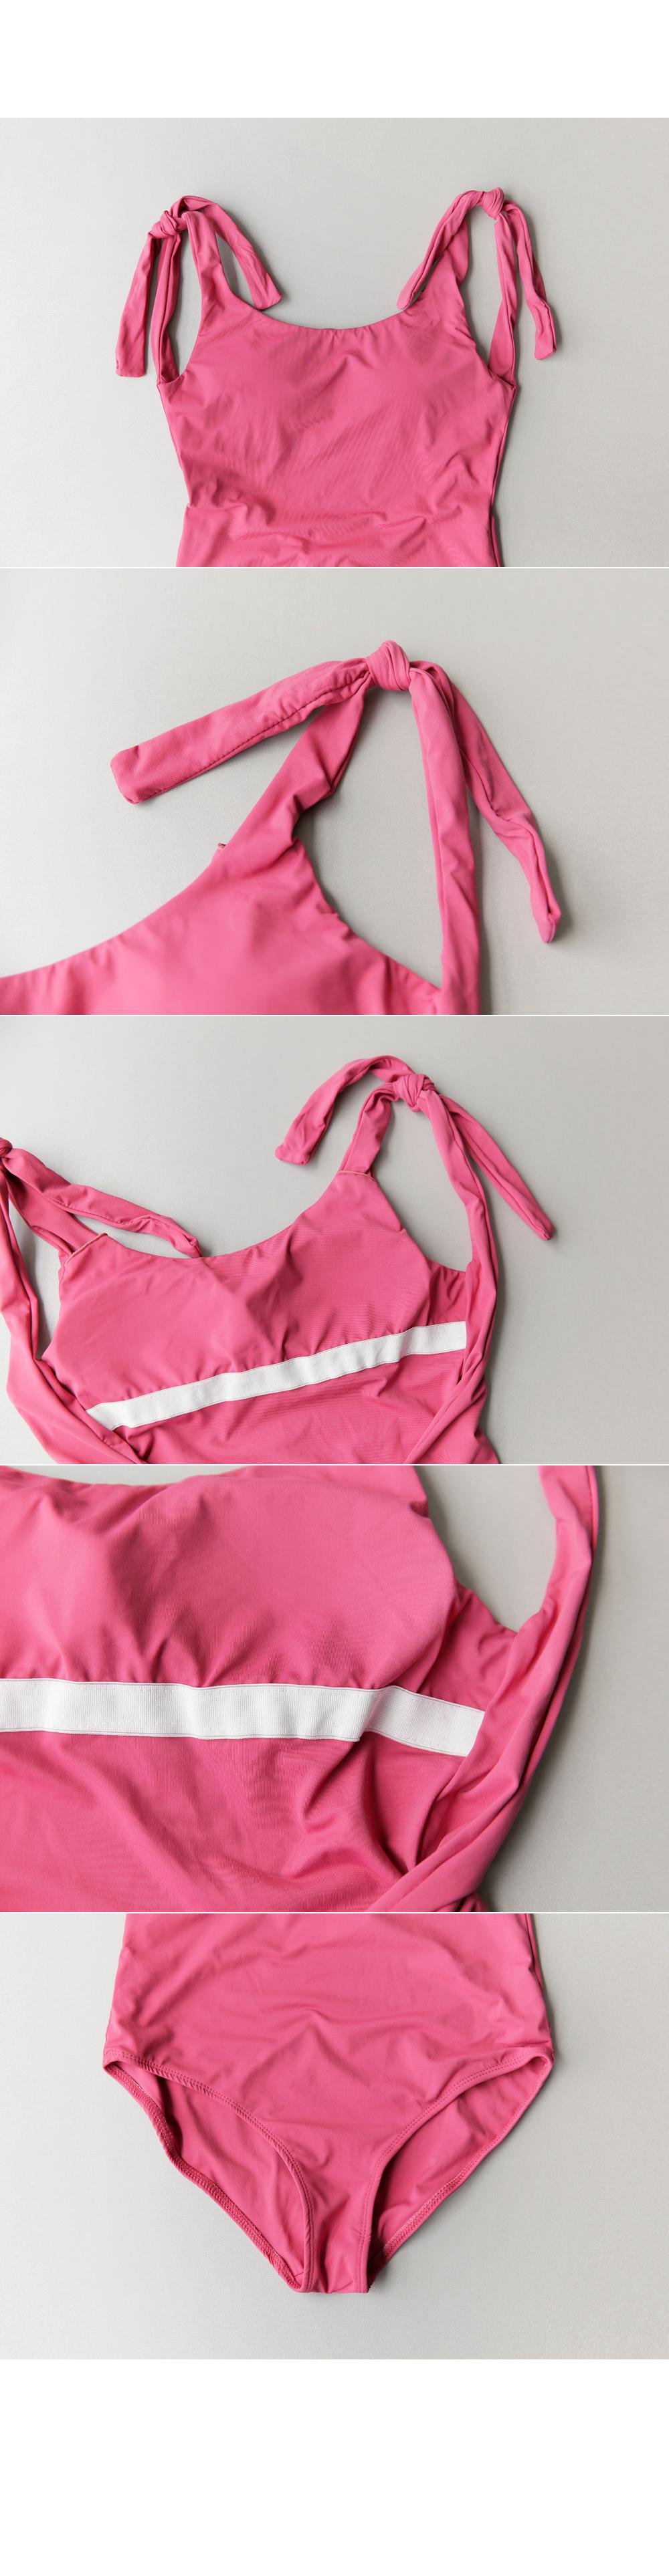 Shoulder ribbon bikini